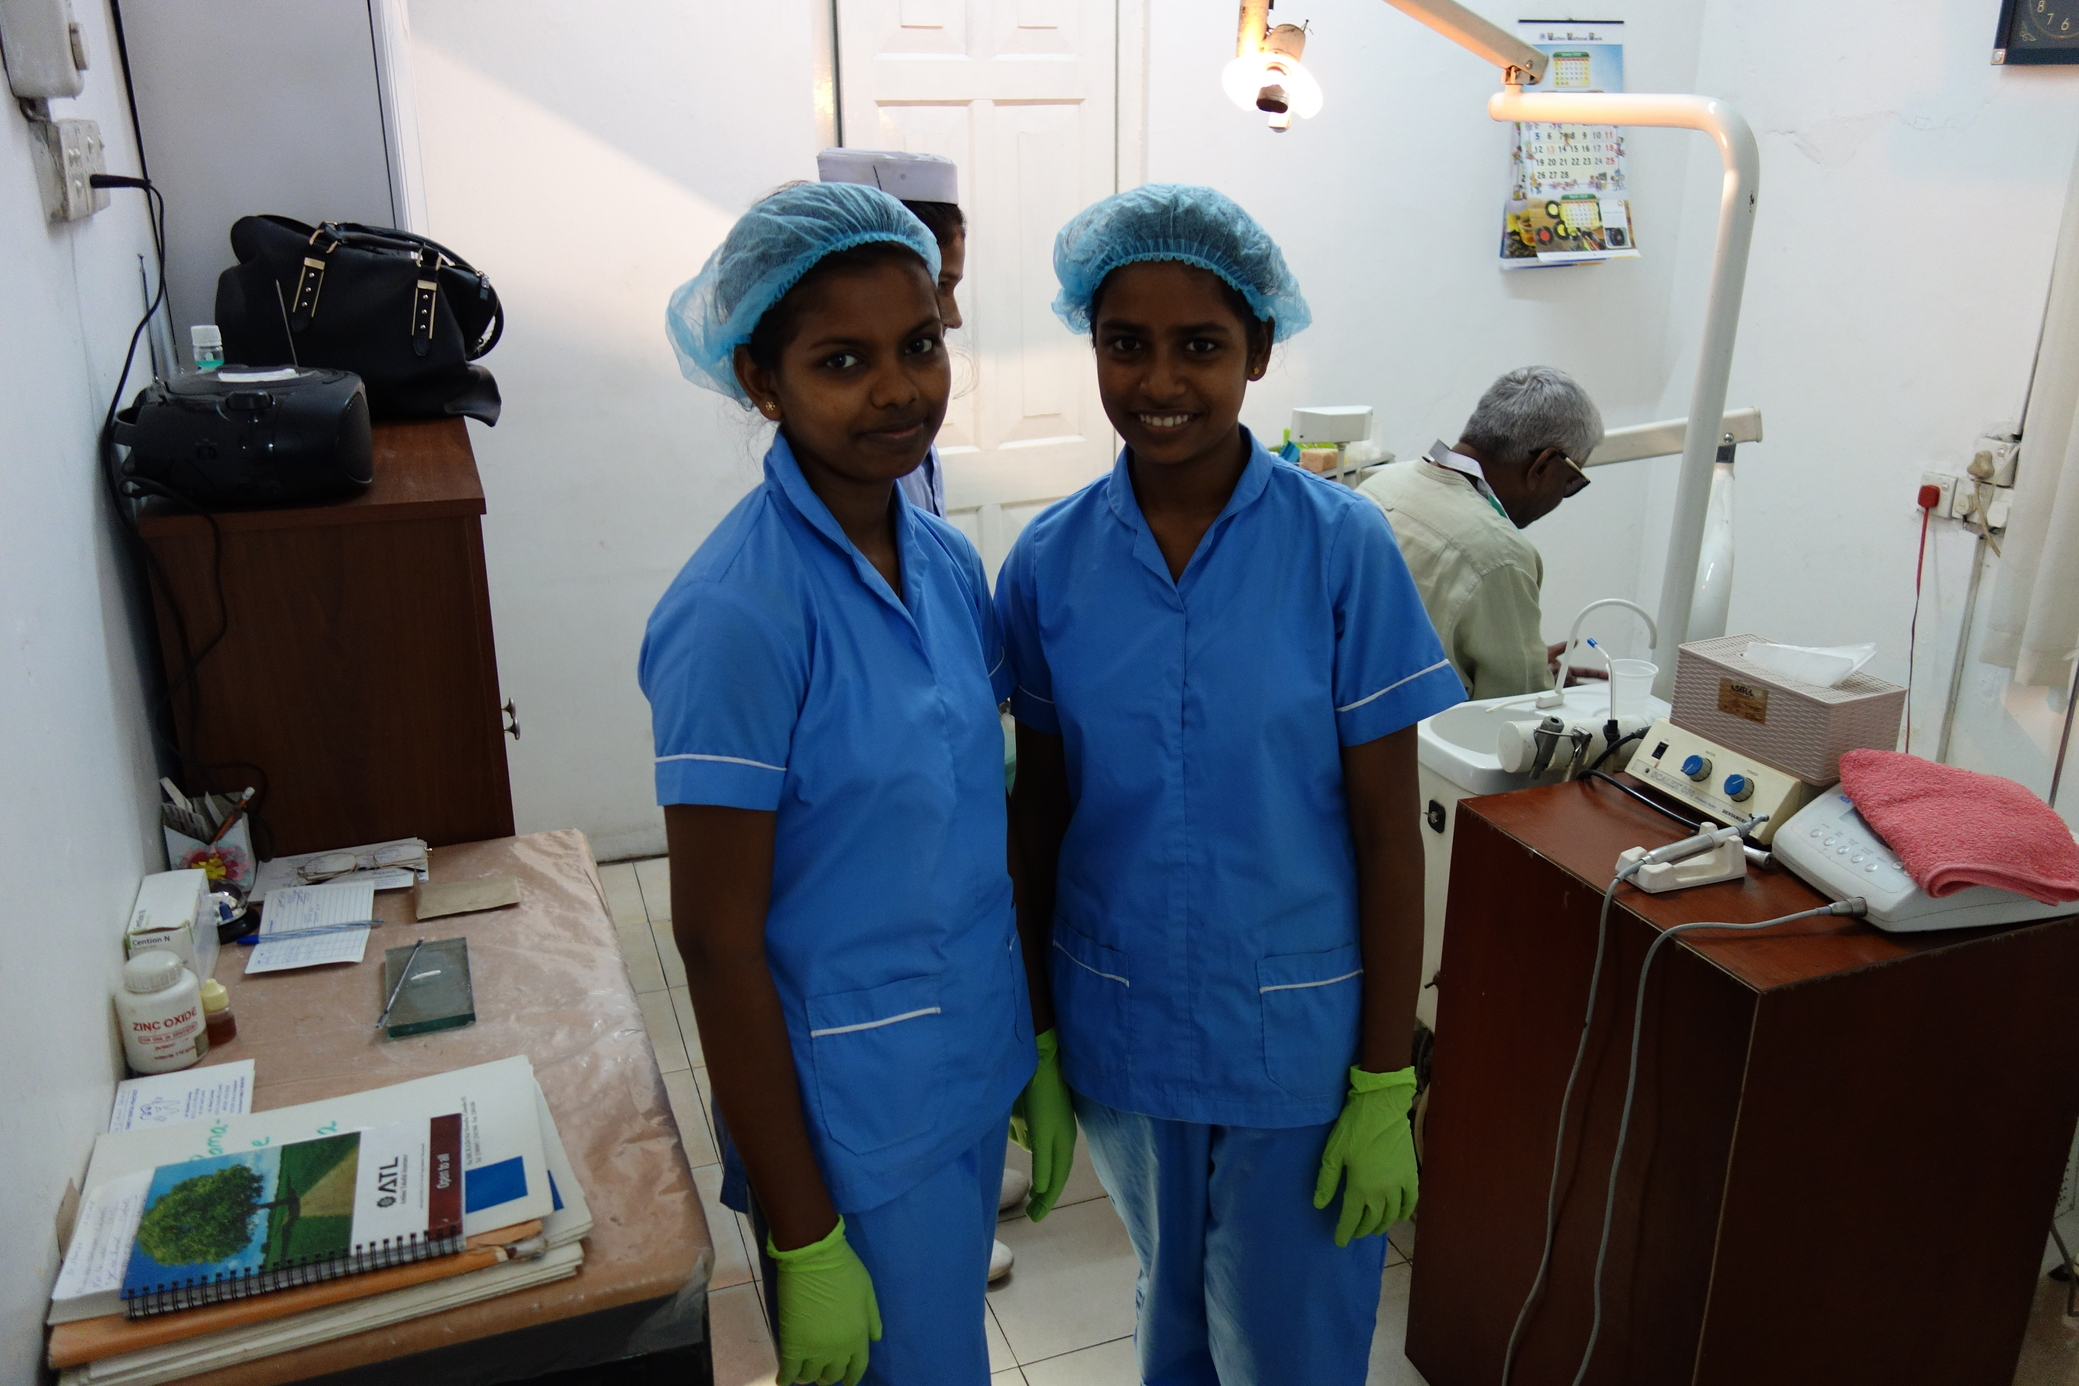 Dental Care International (DCI) Mobile dental care to provide free dental care to children in Colombo Sri Lanka. Dentists, hygienists, dental assistants